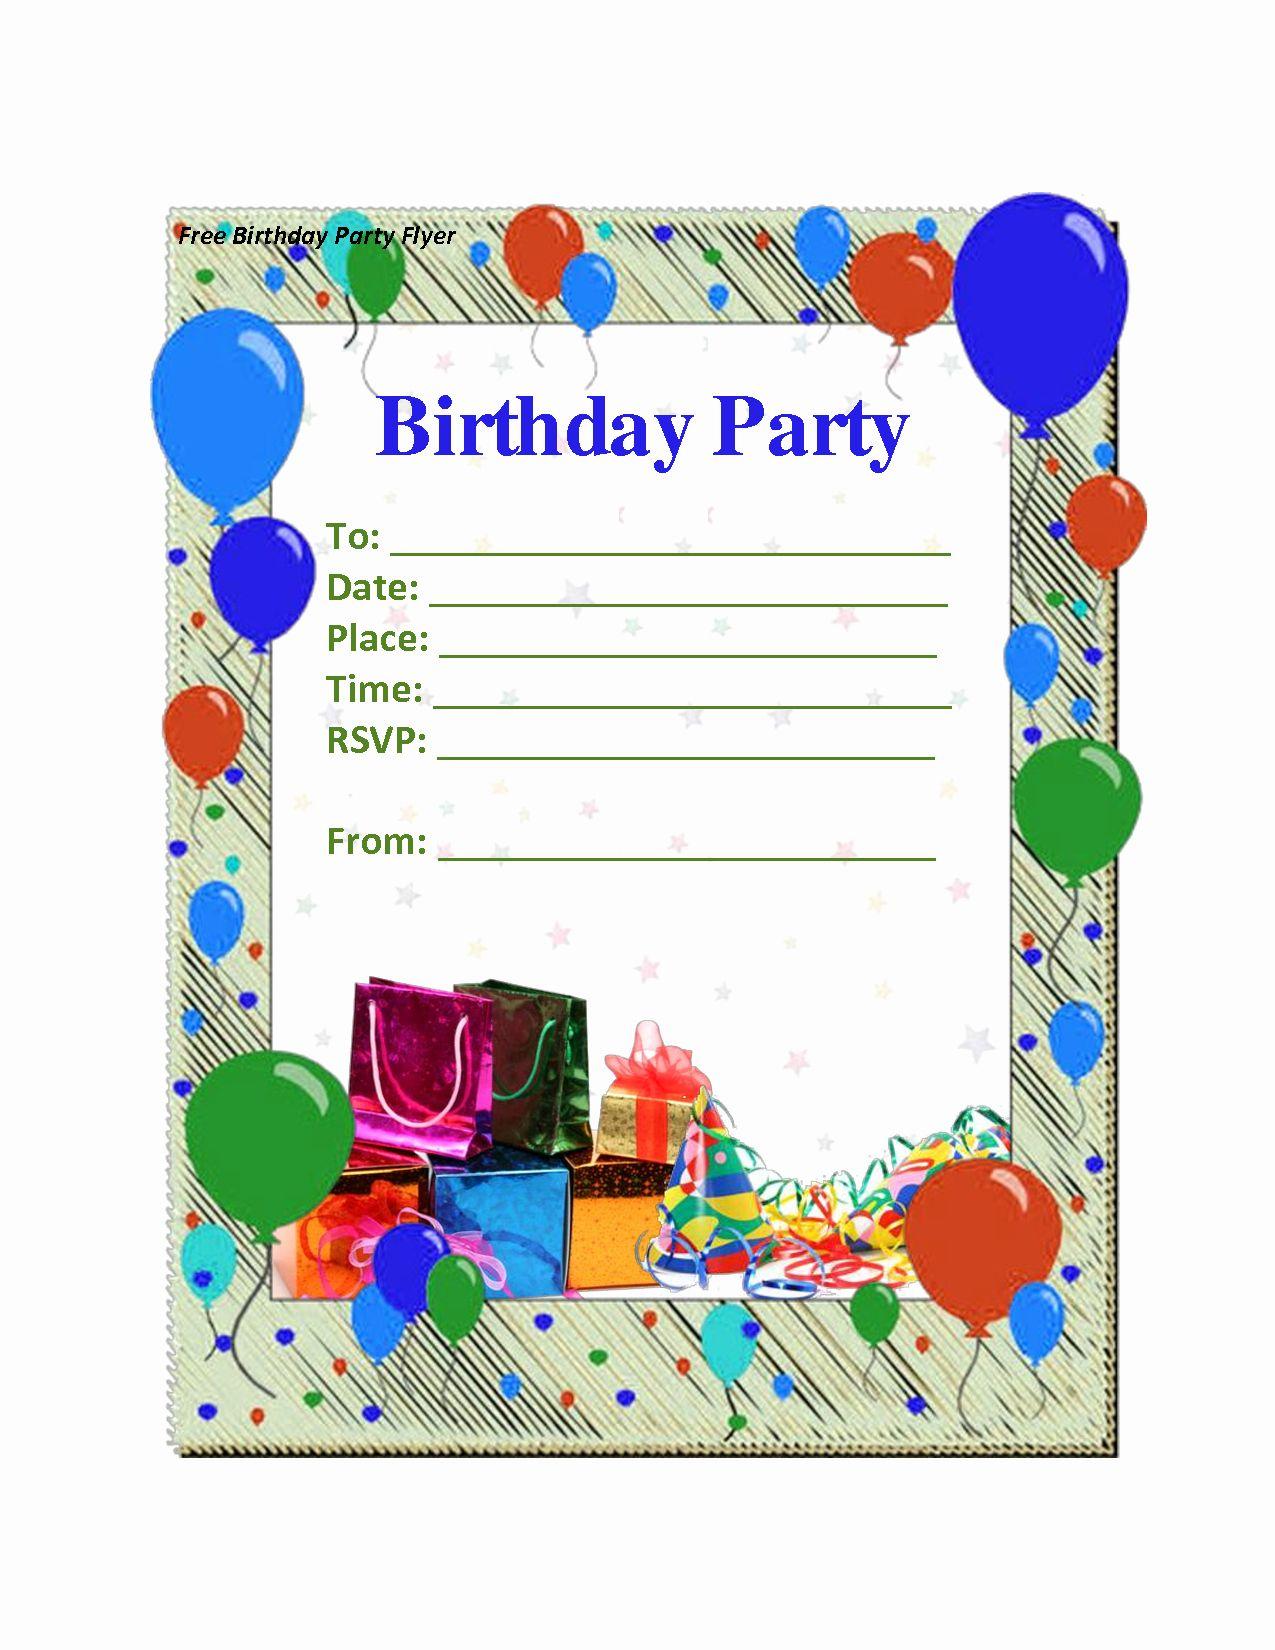 Microsoft Word Invitation Template Free Elegant Microsoft Fice Invitation Te Invitation Card Birthday Create Birthday Invitations Birthday Invitation Templates